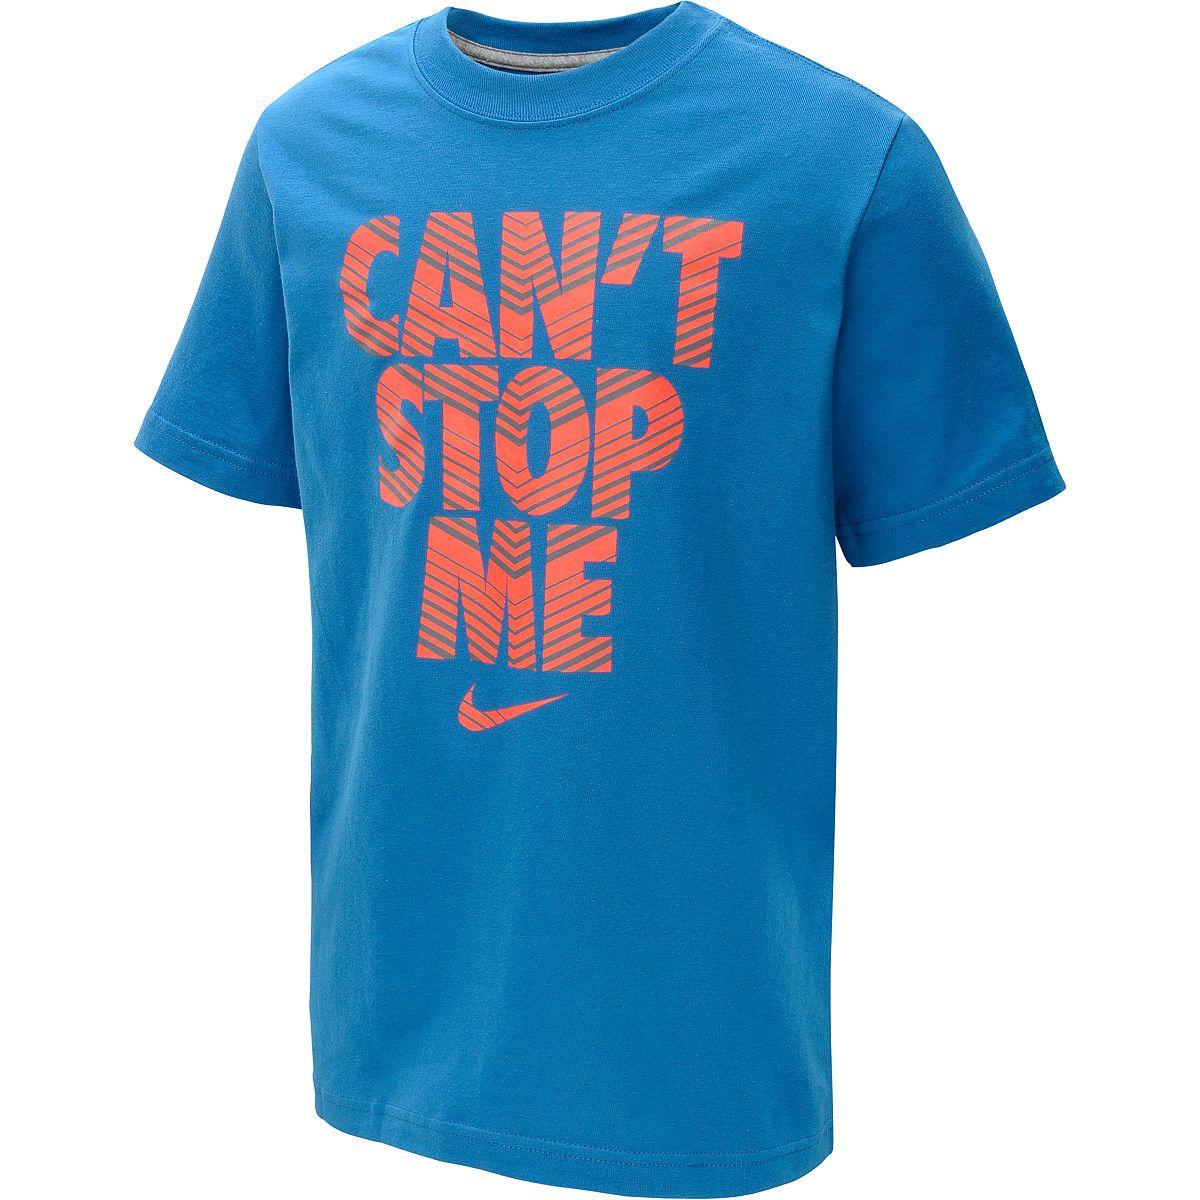 NIKE Boys' Can't Stop Me ShortSleeve TShirt